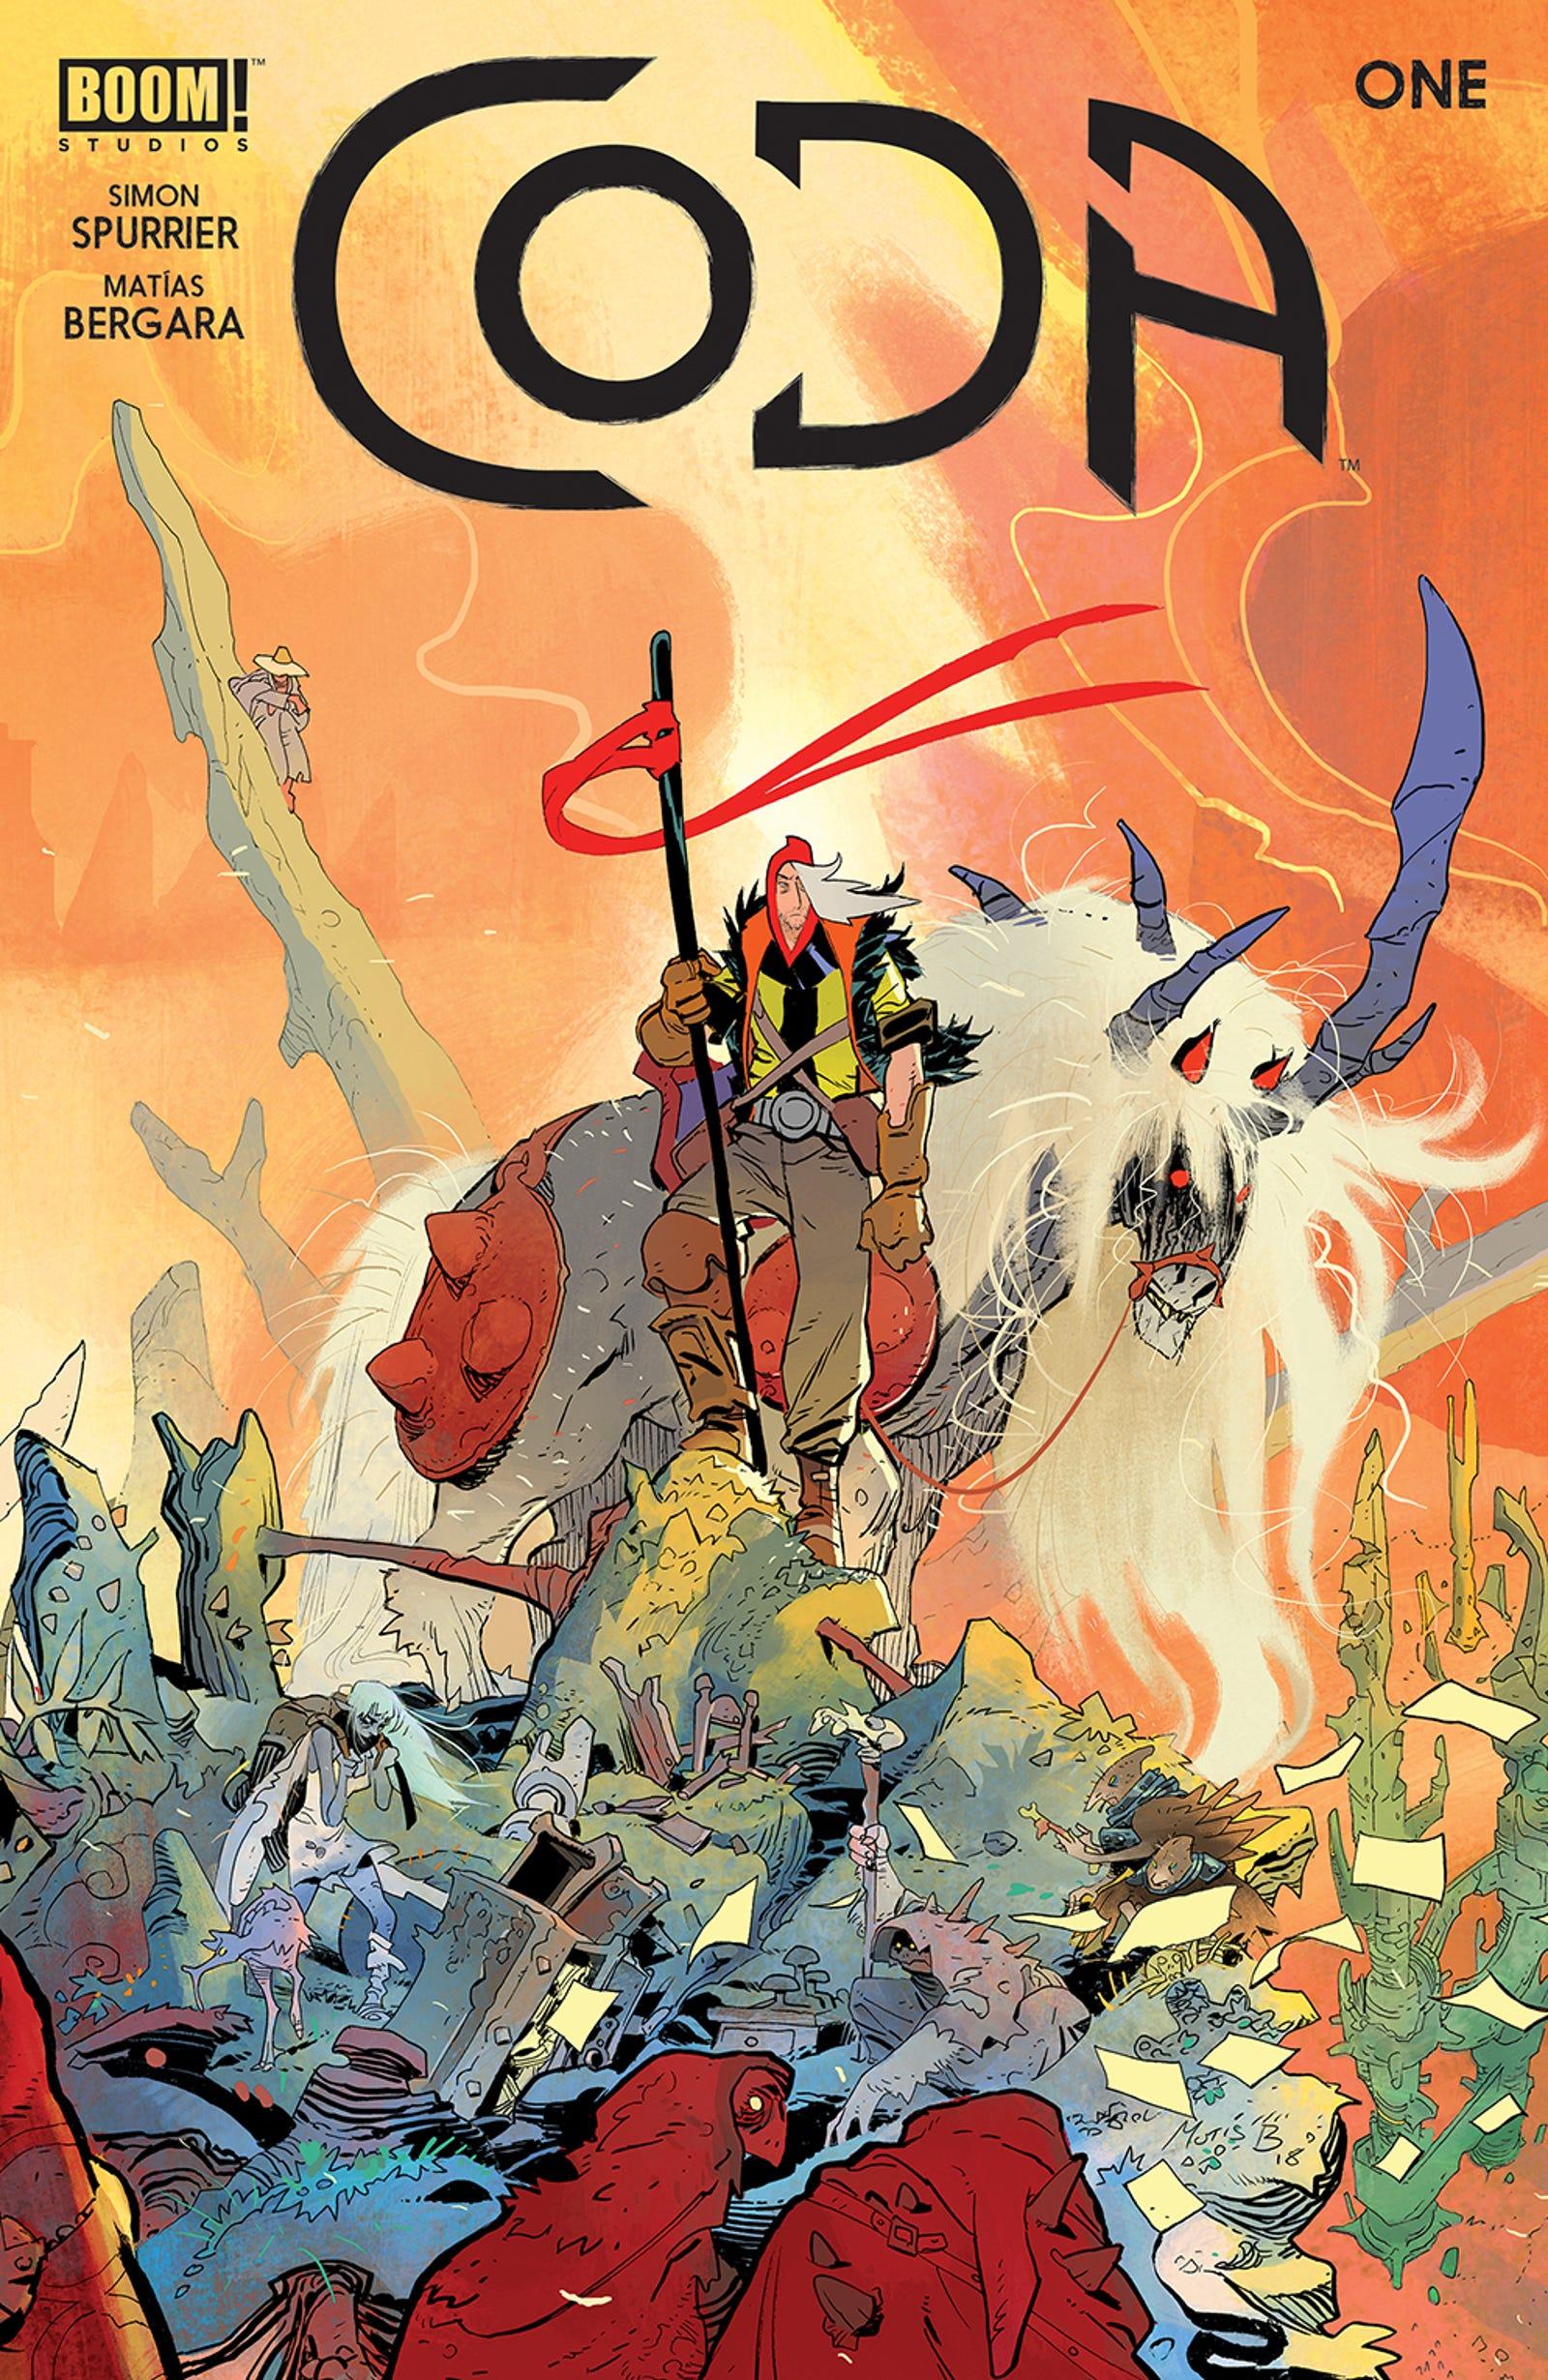 Illustration for article titled iCoda/i #1 is the start of a wild and wonderful apocalypseem/em